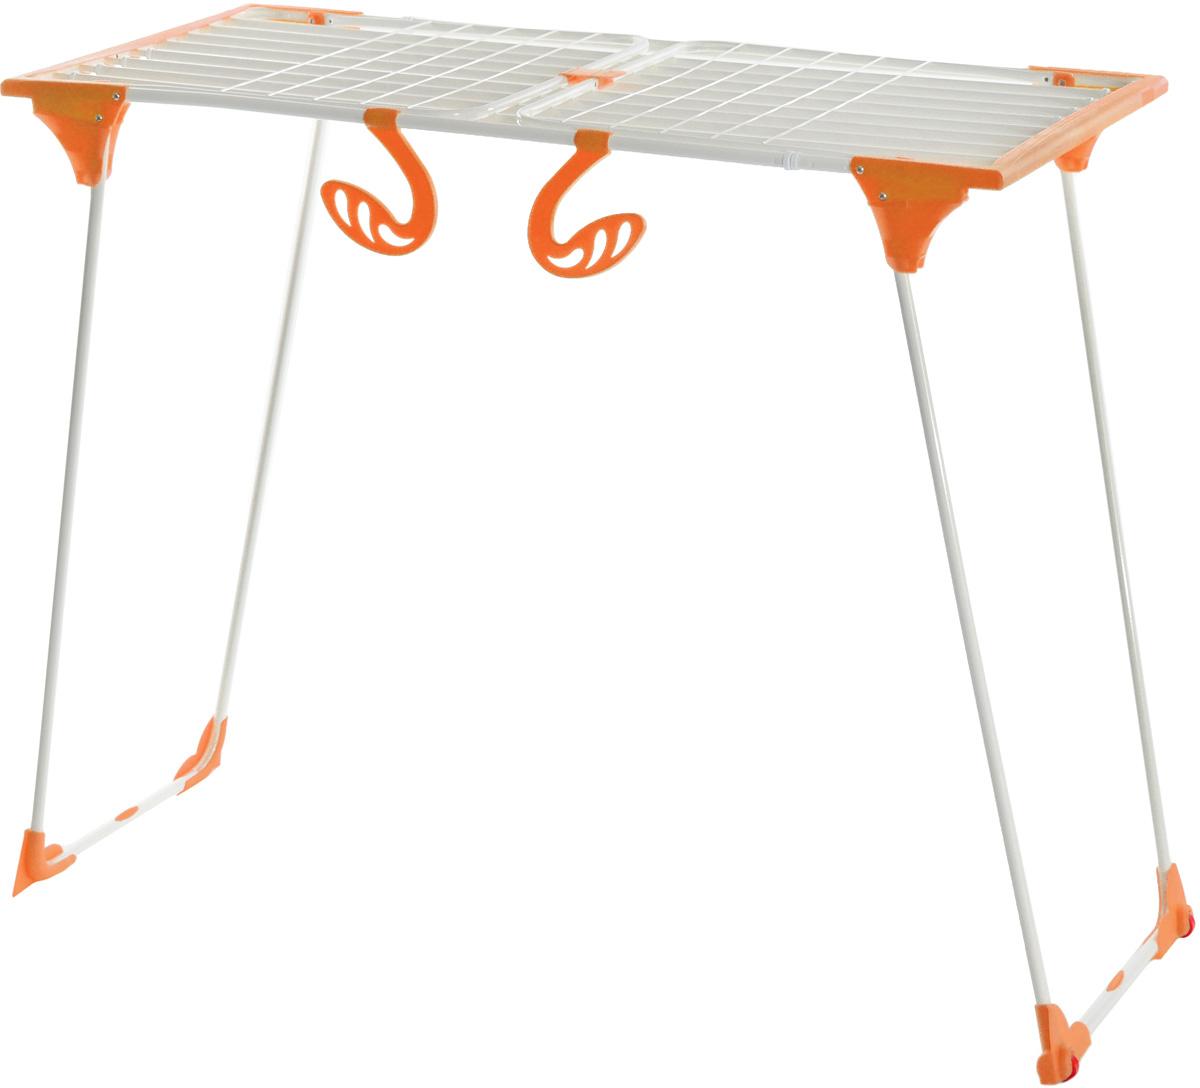 "Сушилка для белья Gimi ""Dinamik 30 Color"", напольная, цвет: белый, оранжевый, 257 х 57 х 102 см"